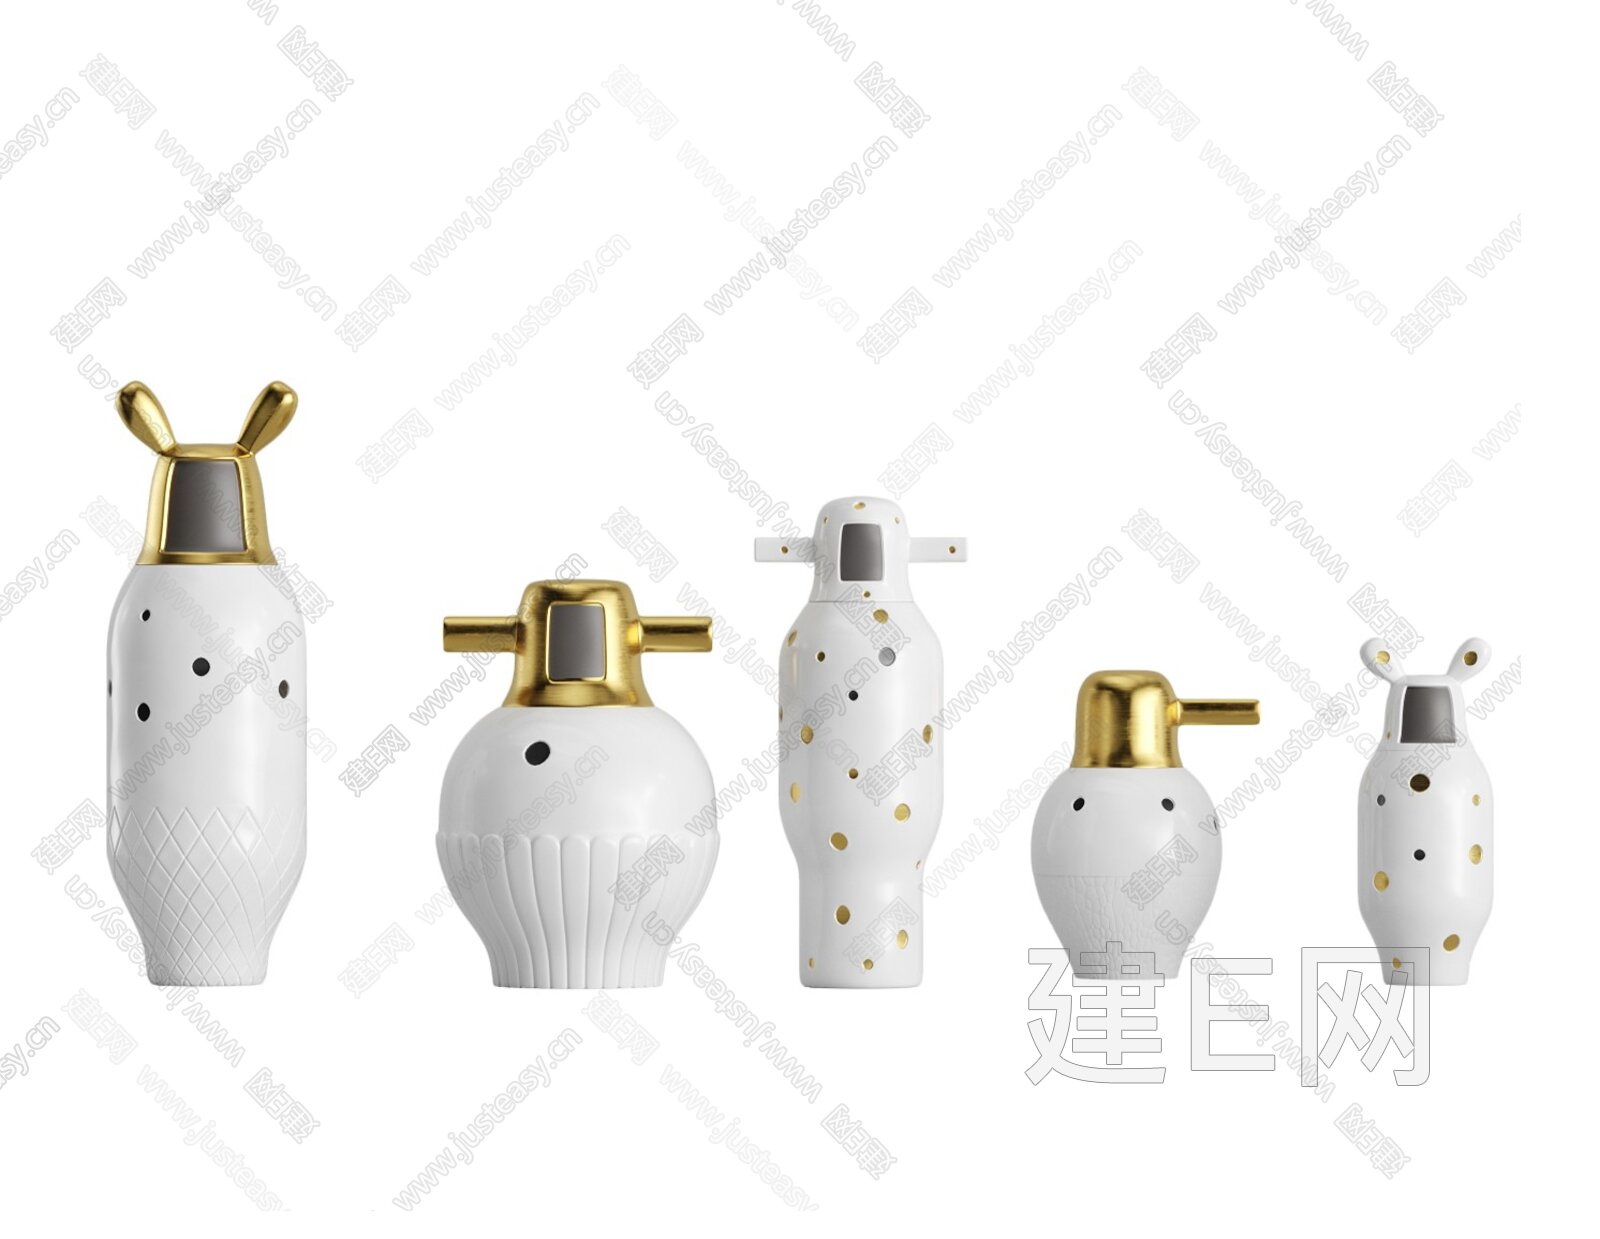 b.d barcelona design 现代花瓶摆件3d模型